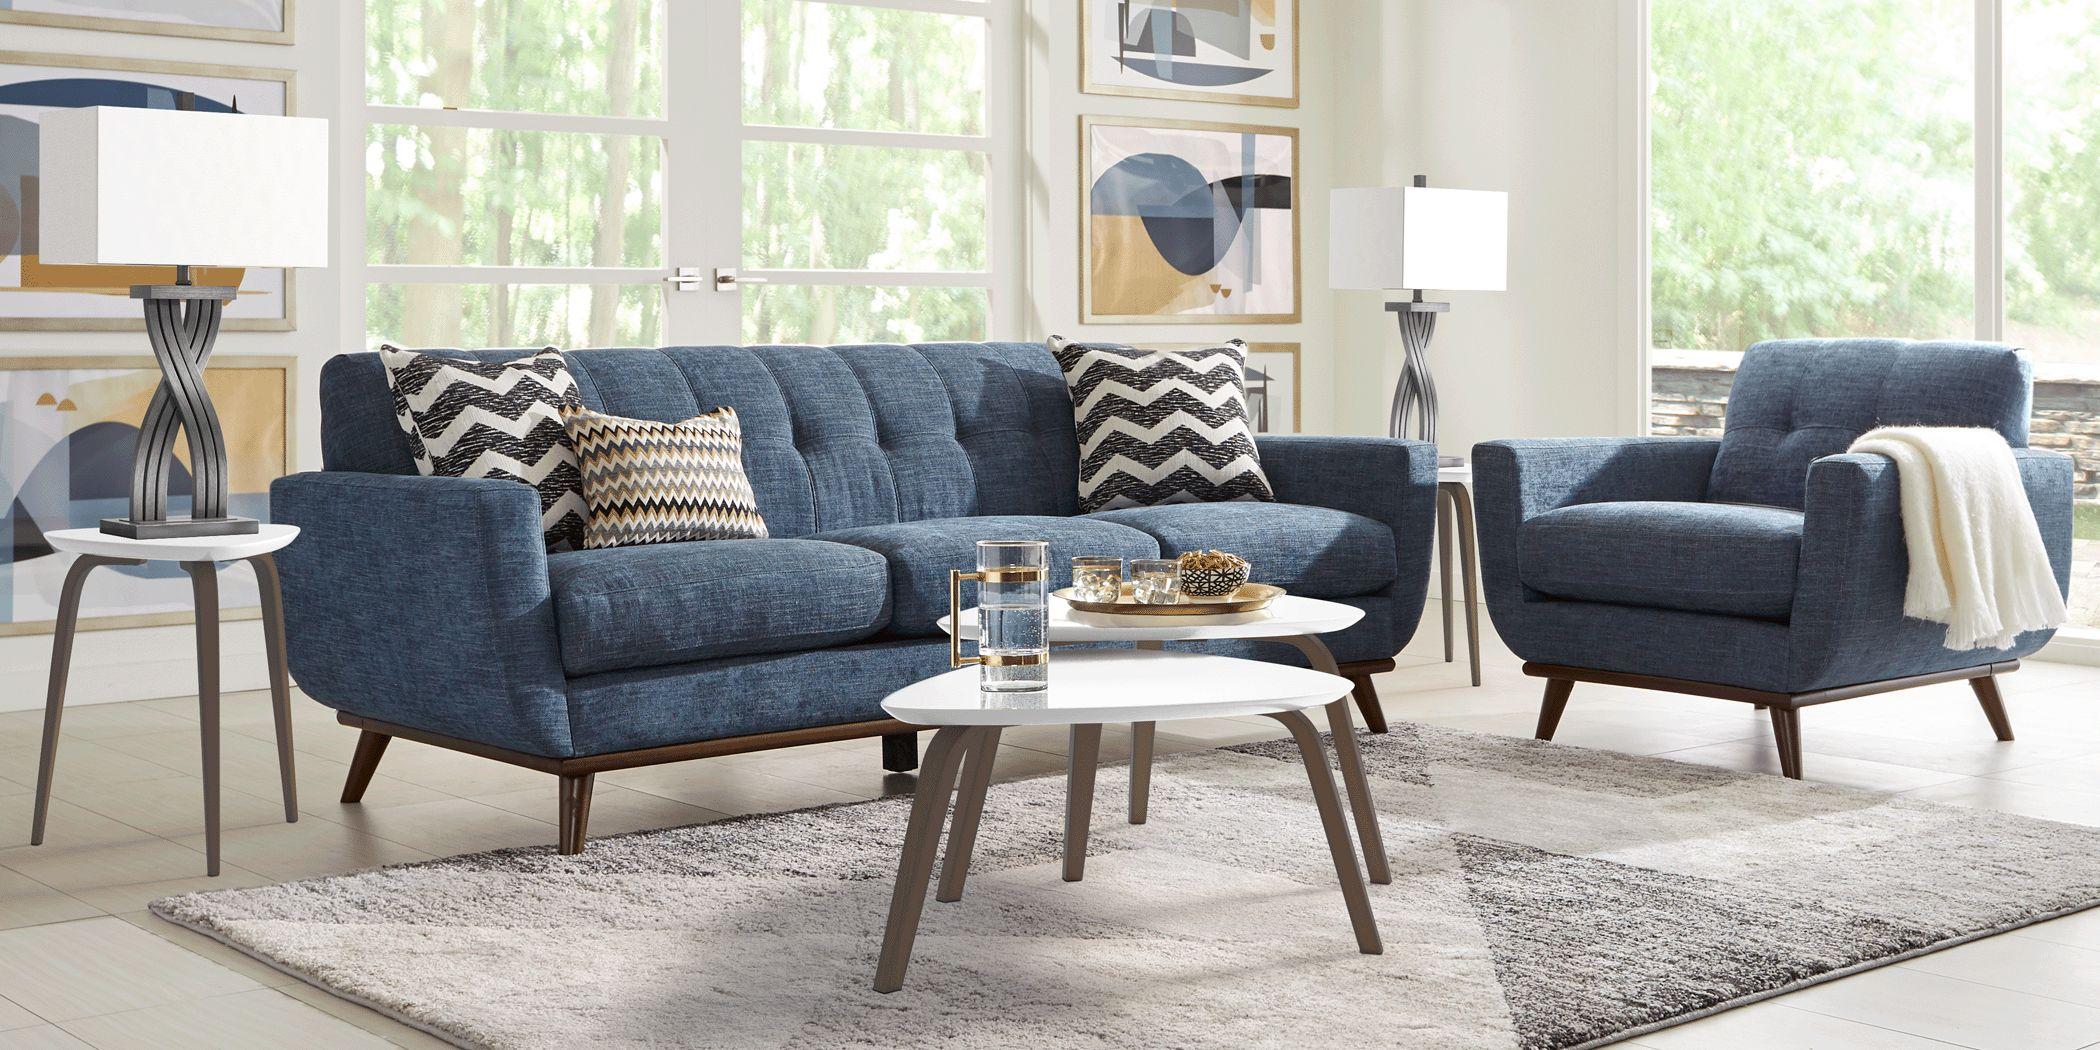 East Side Sapphire 6 Pc Living Room